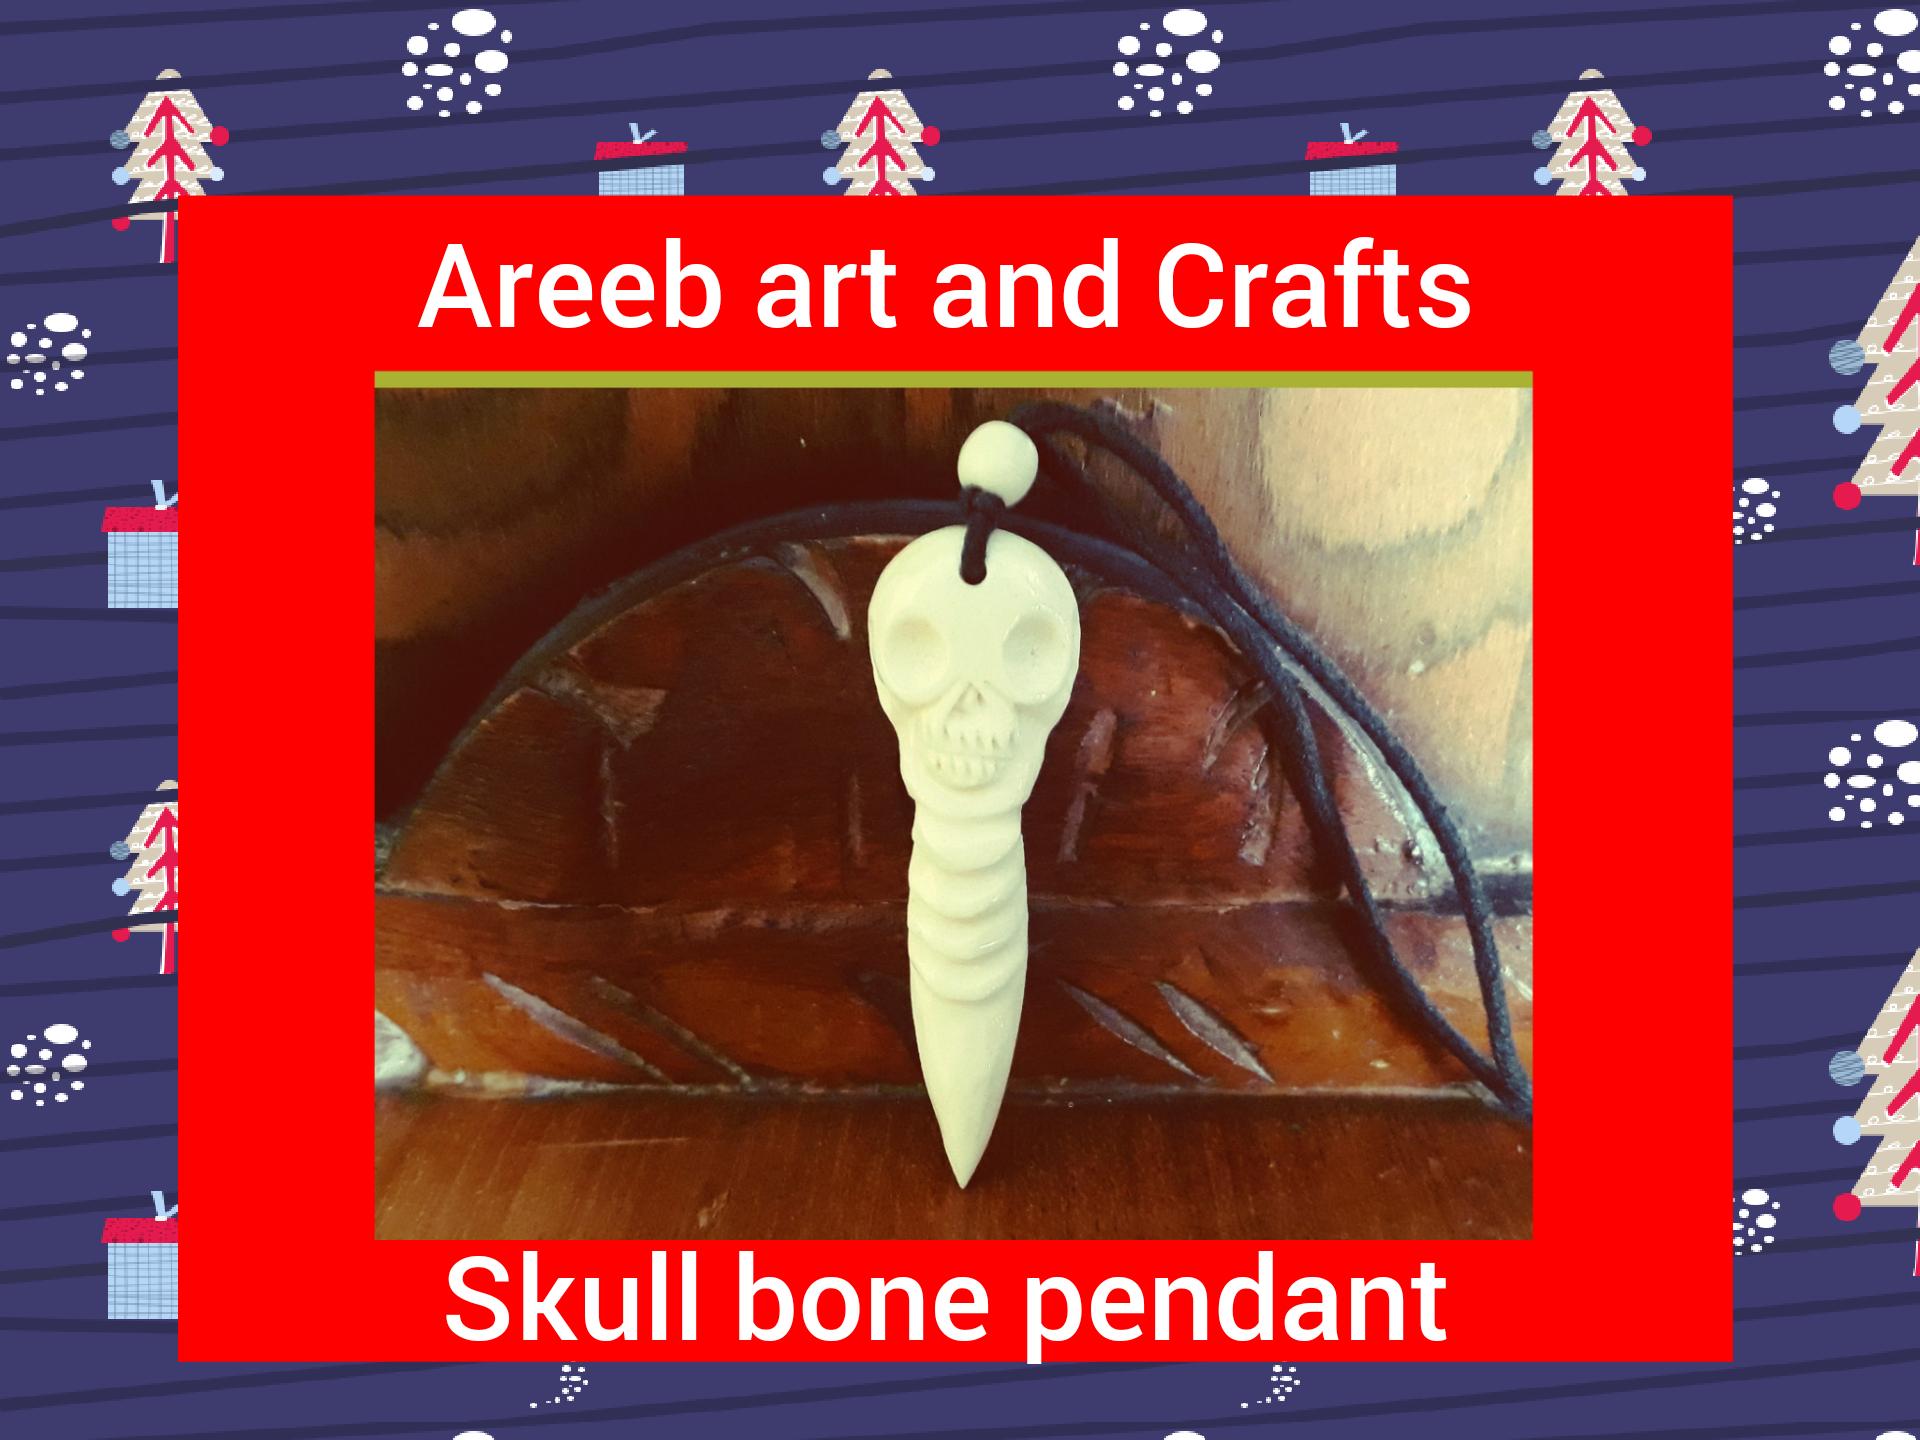 Bone sukll pendant